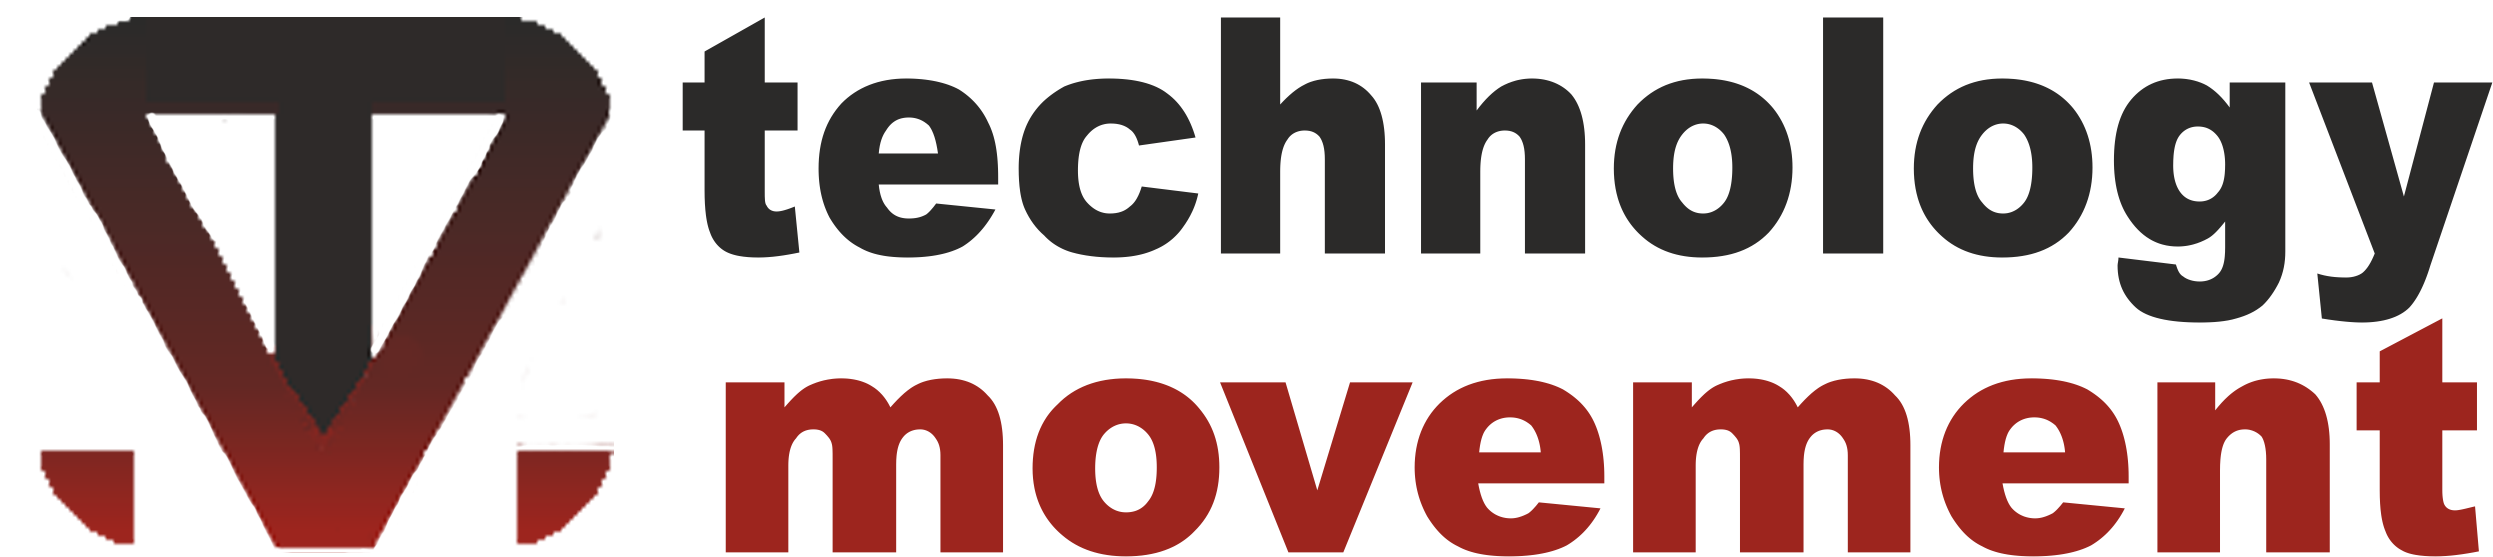 Technology Movement LLC / ТОВ ТЕХНОЛОДЖІ МУВМЕНТ